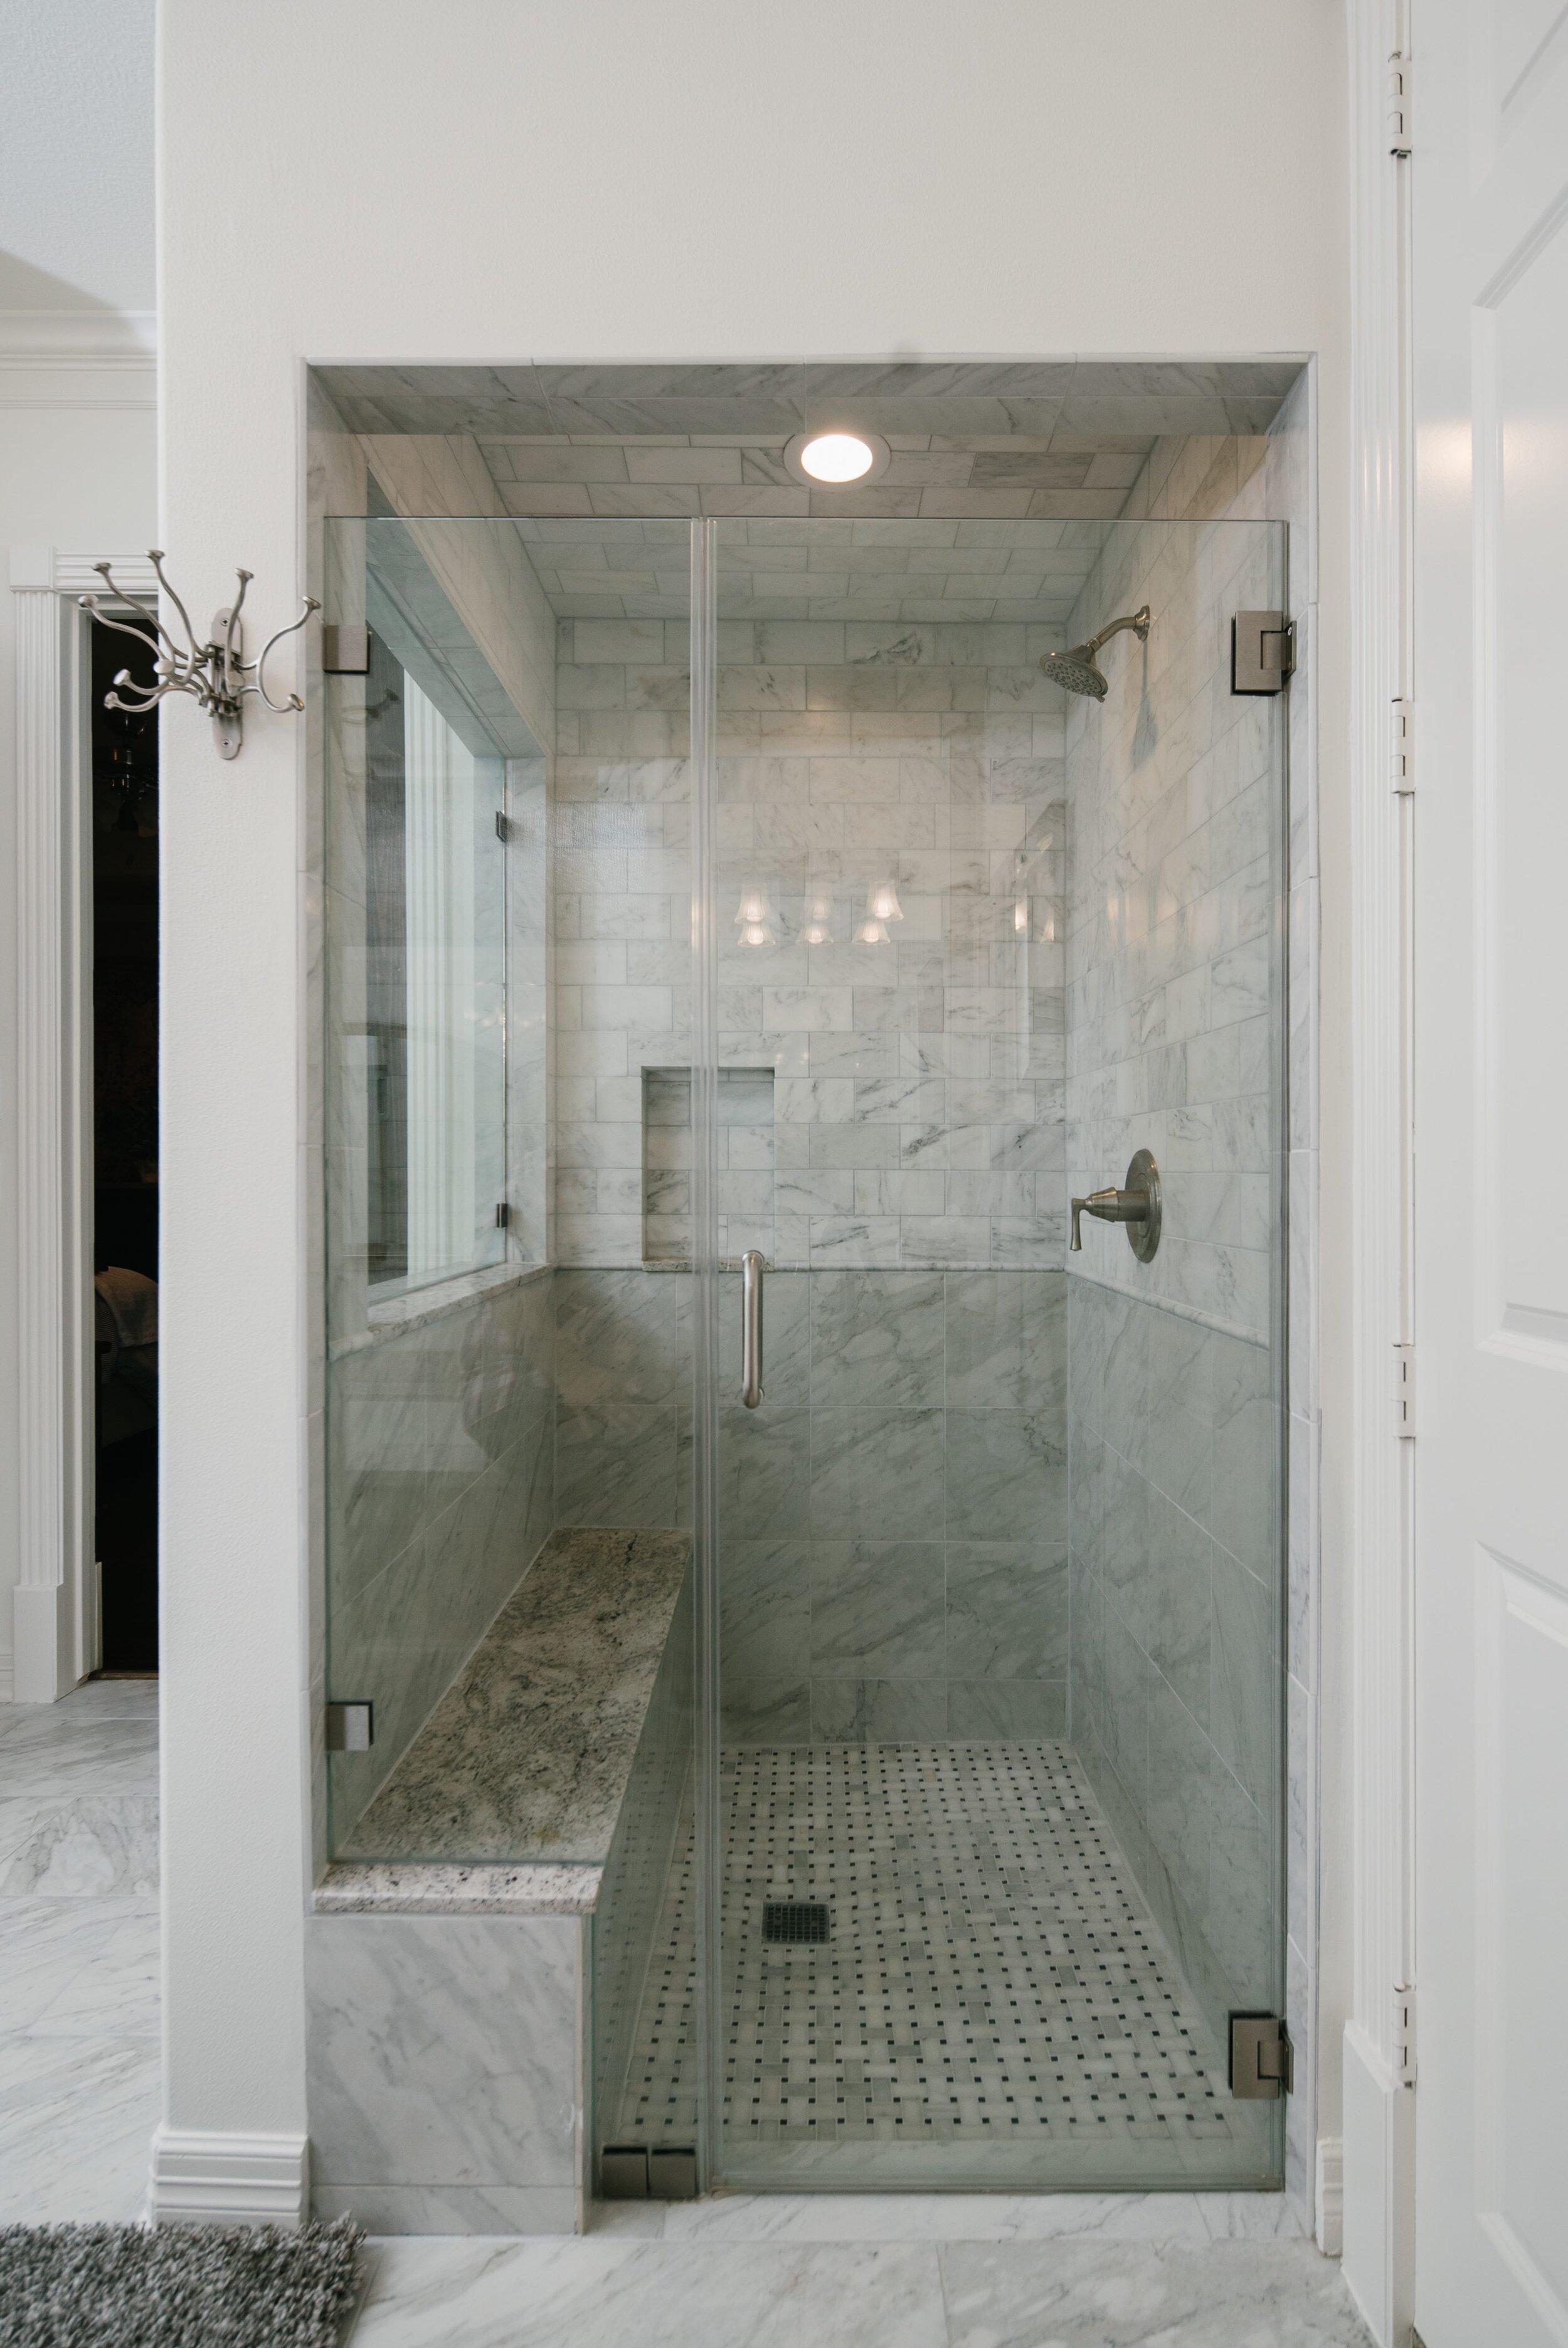 Walk-in frameless shower, glass, shower bench seat, shampoo niche, carrara marble tile, basketweave tile, grey and white carrara tile, shower remodel, dream shower, grey shower, shower inspiration.